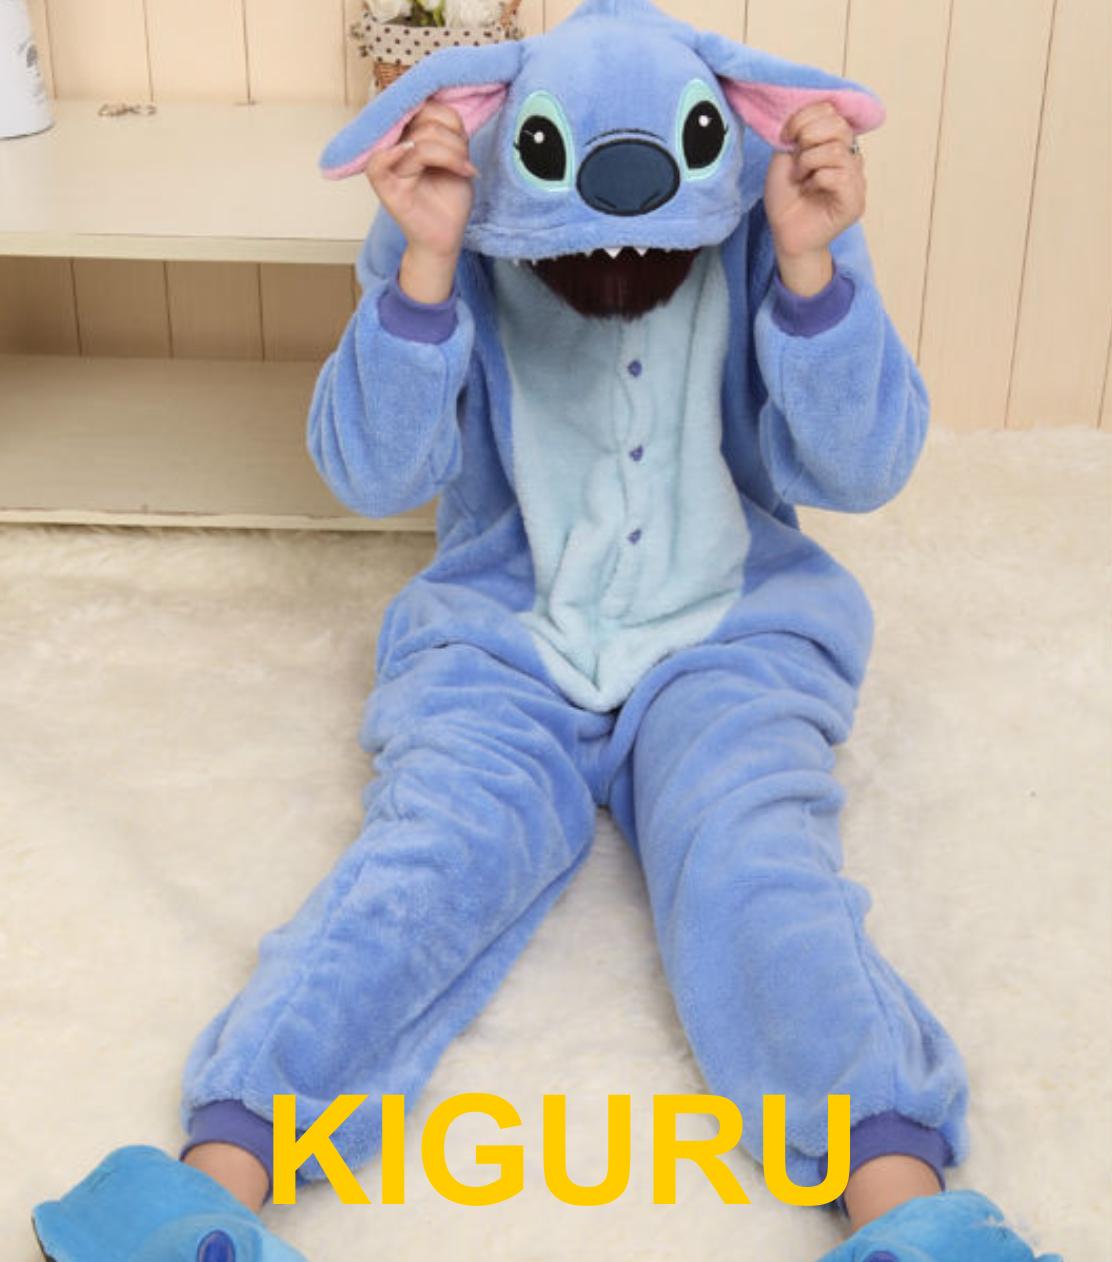 Кигуруми стич теплая пижама S (150-160cm), Фланель - KIGURU в Киеве